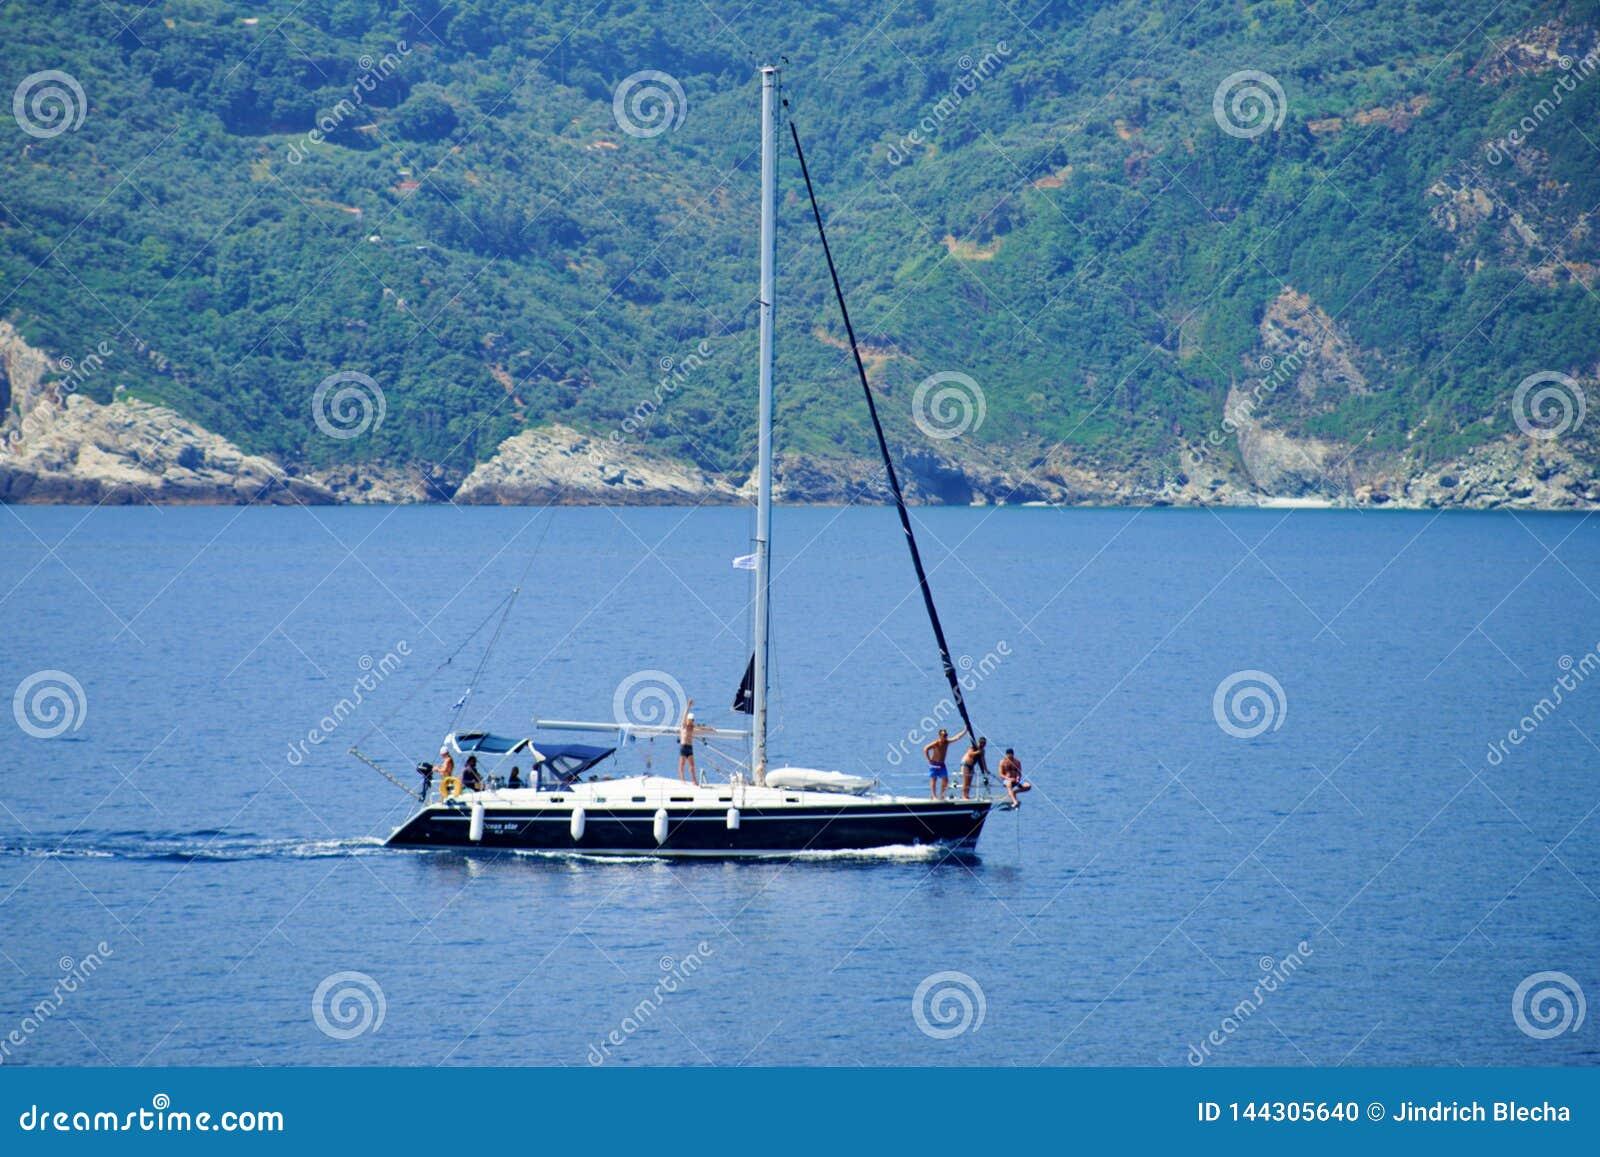 Sailing near Skopelos, Greece